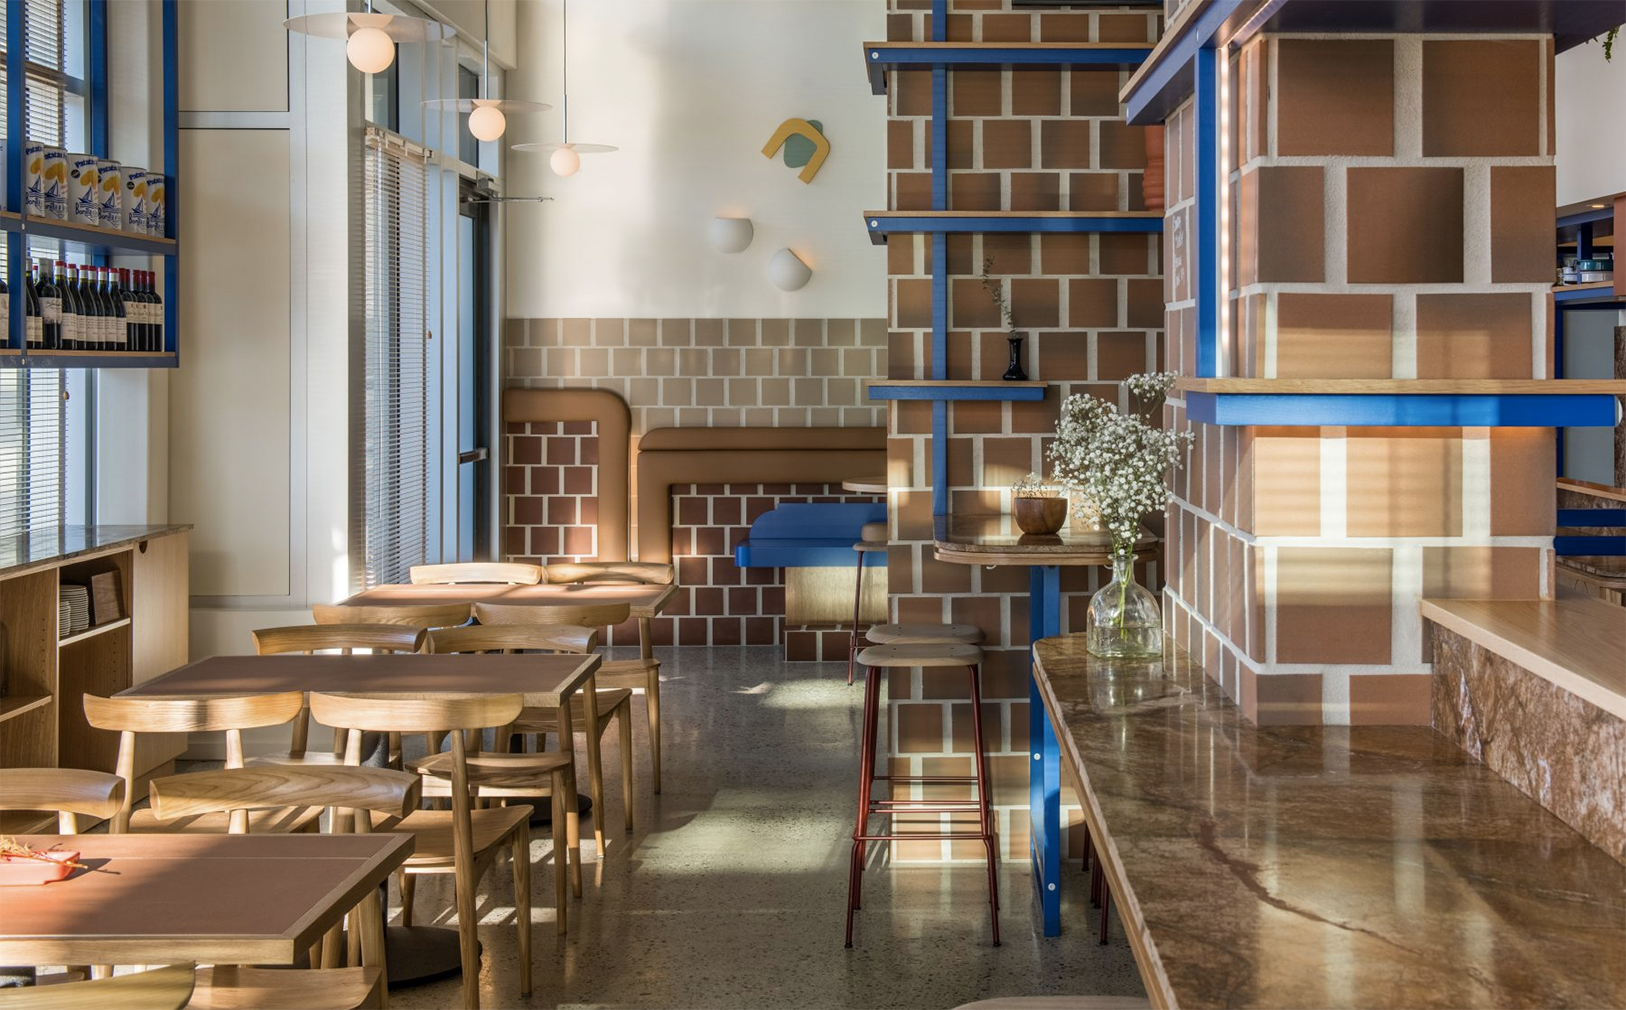 Vancouver's Como Taperia serves up Spanish classics